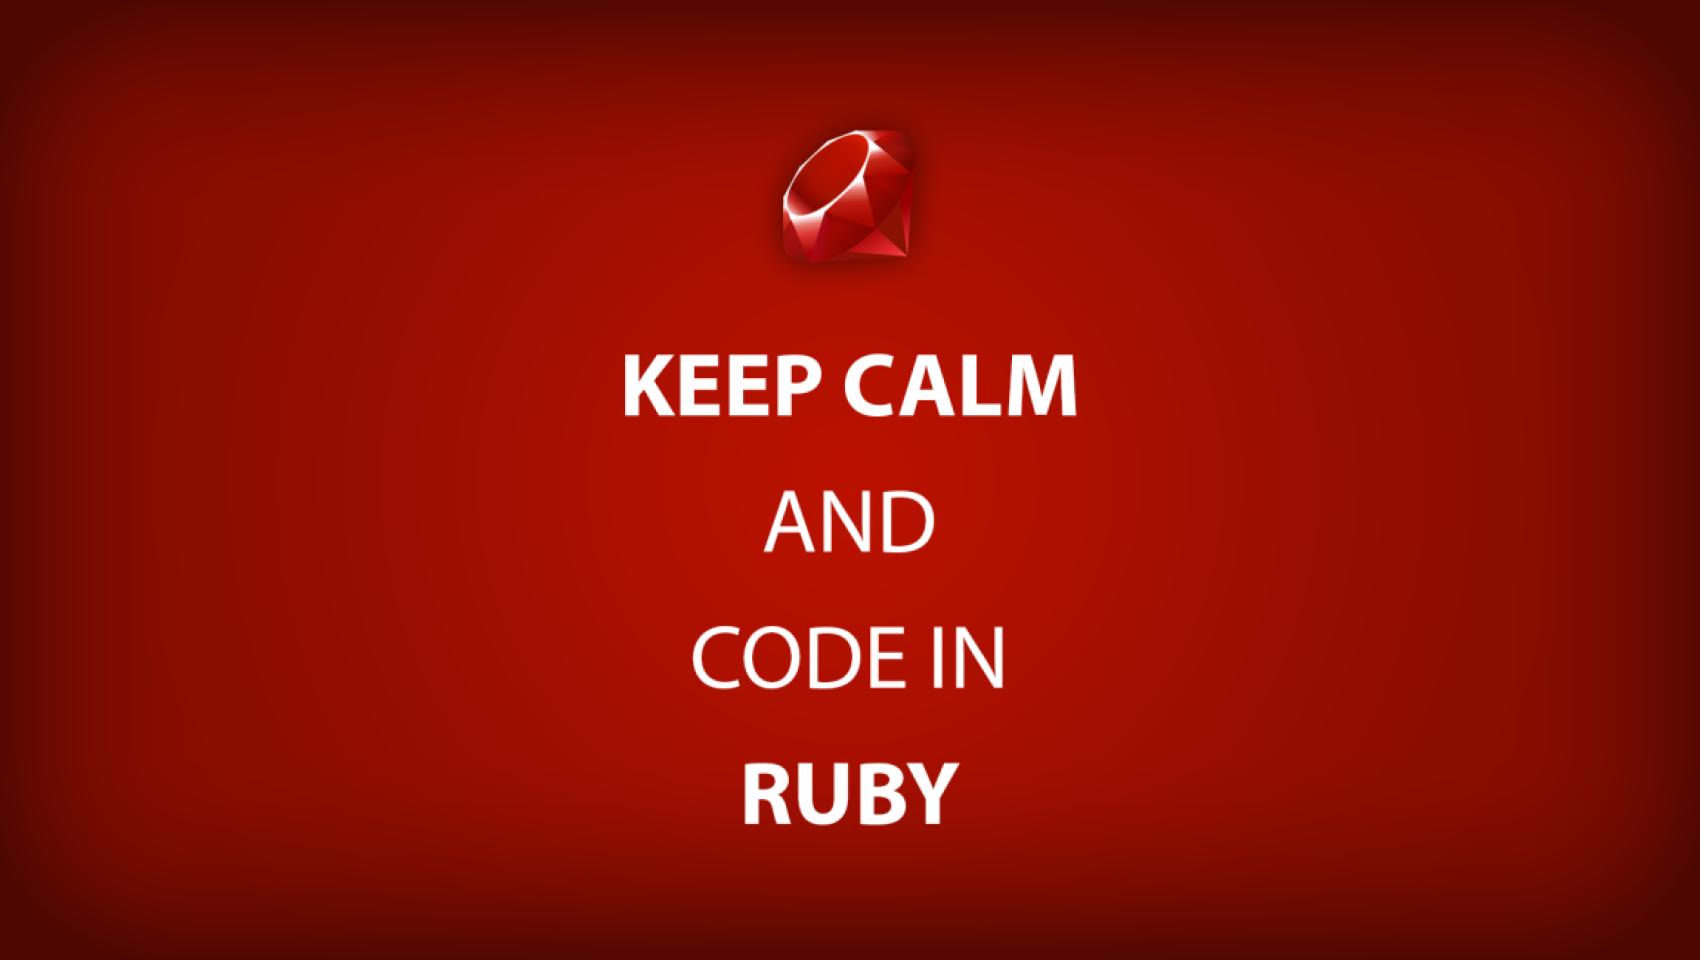 В чем преимущества разработки на Ruby